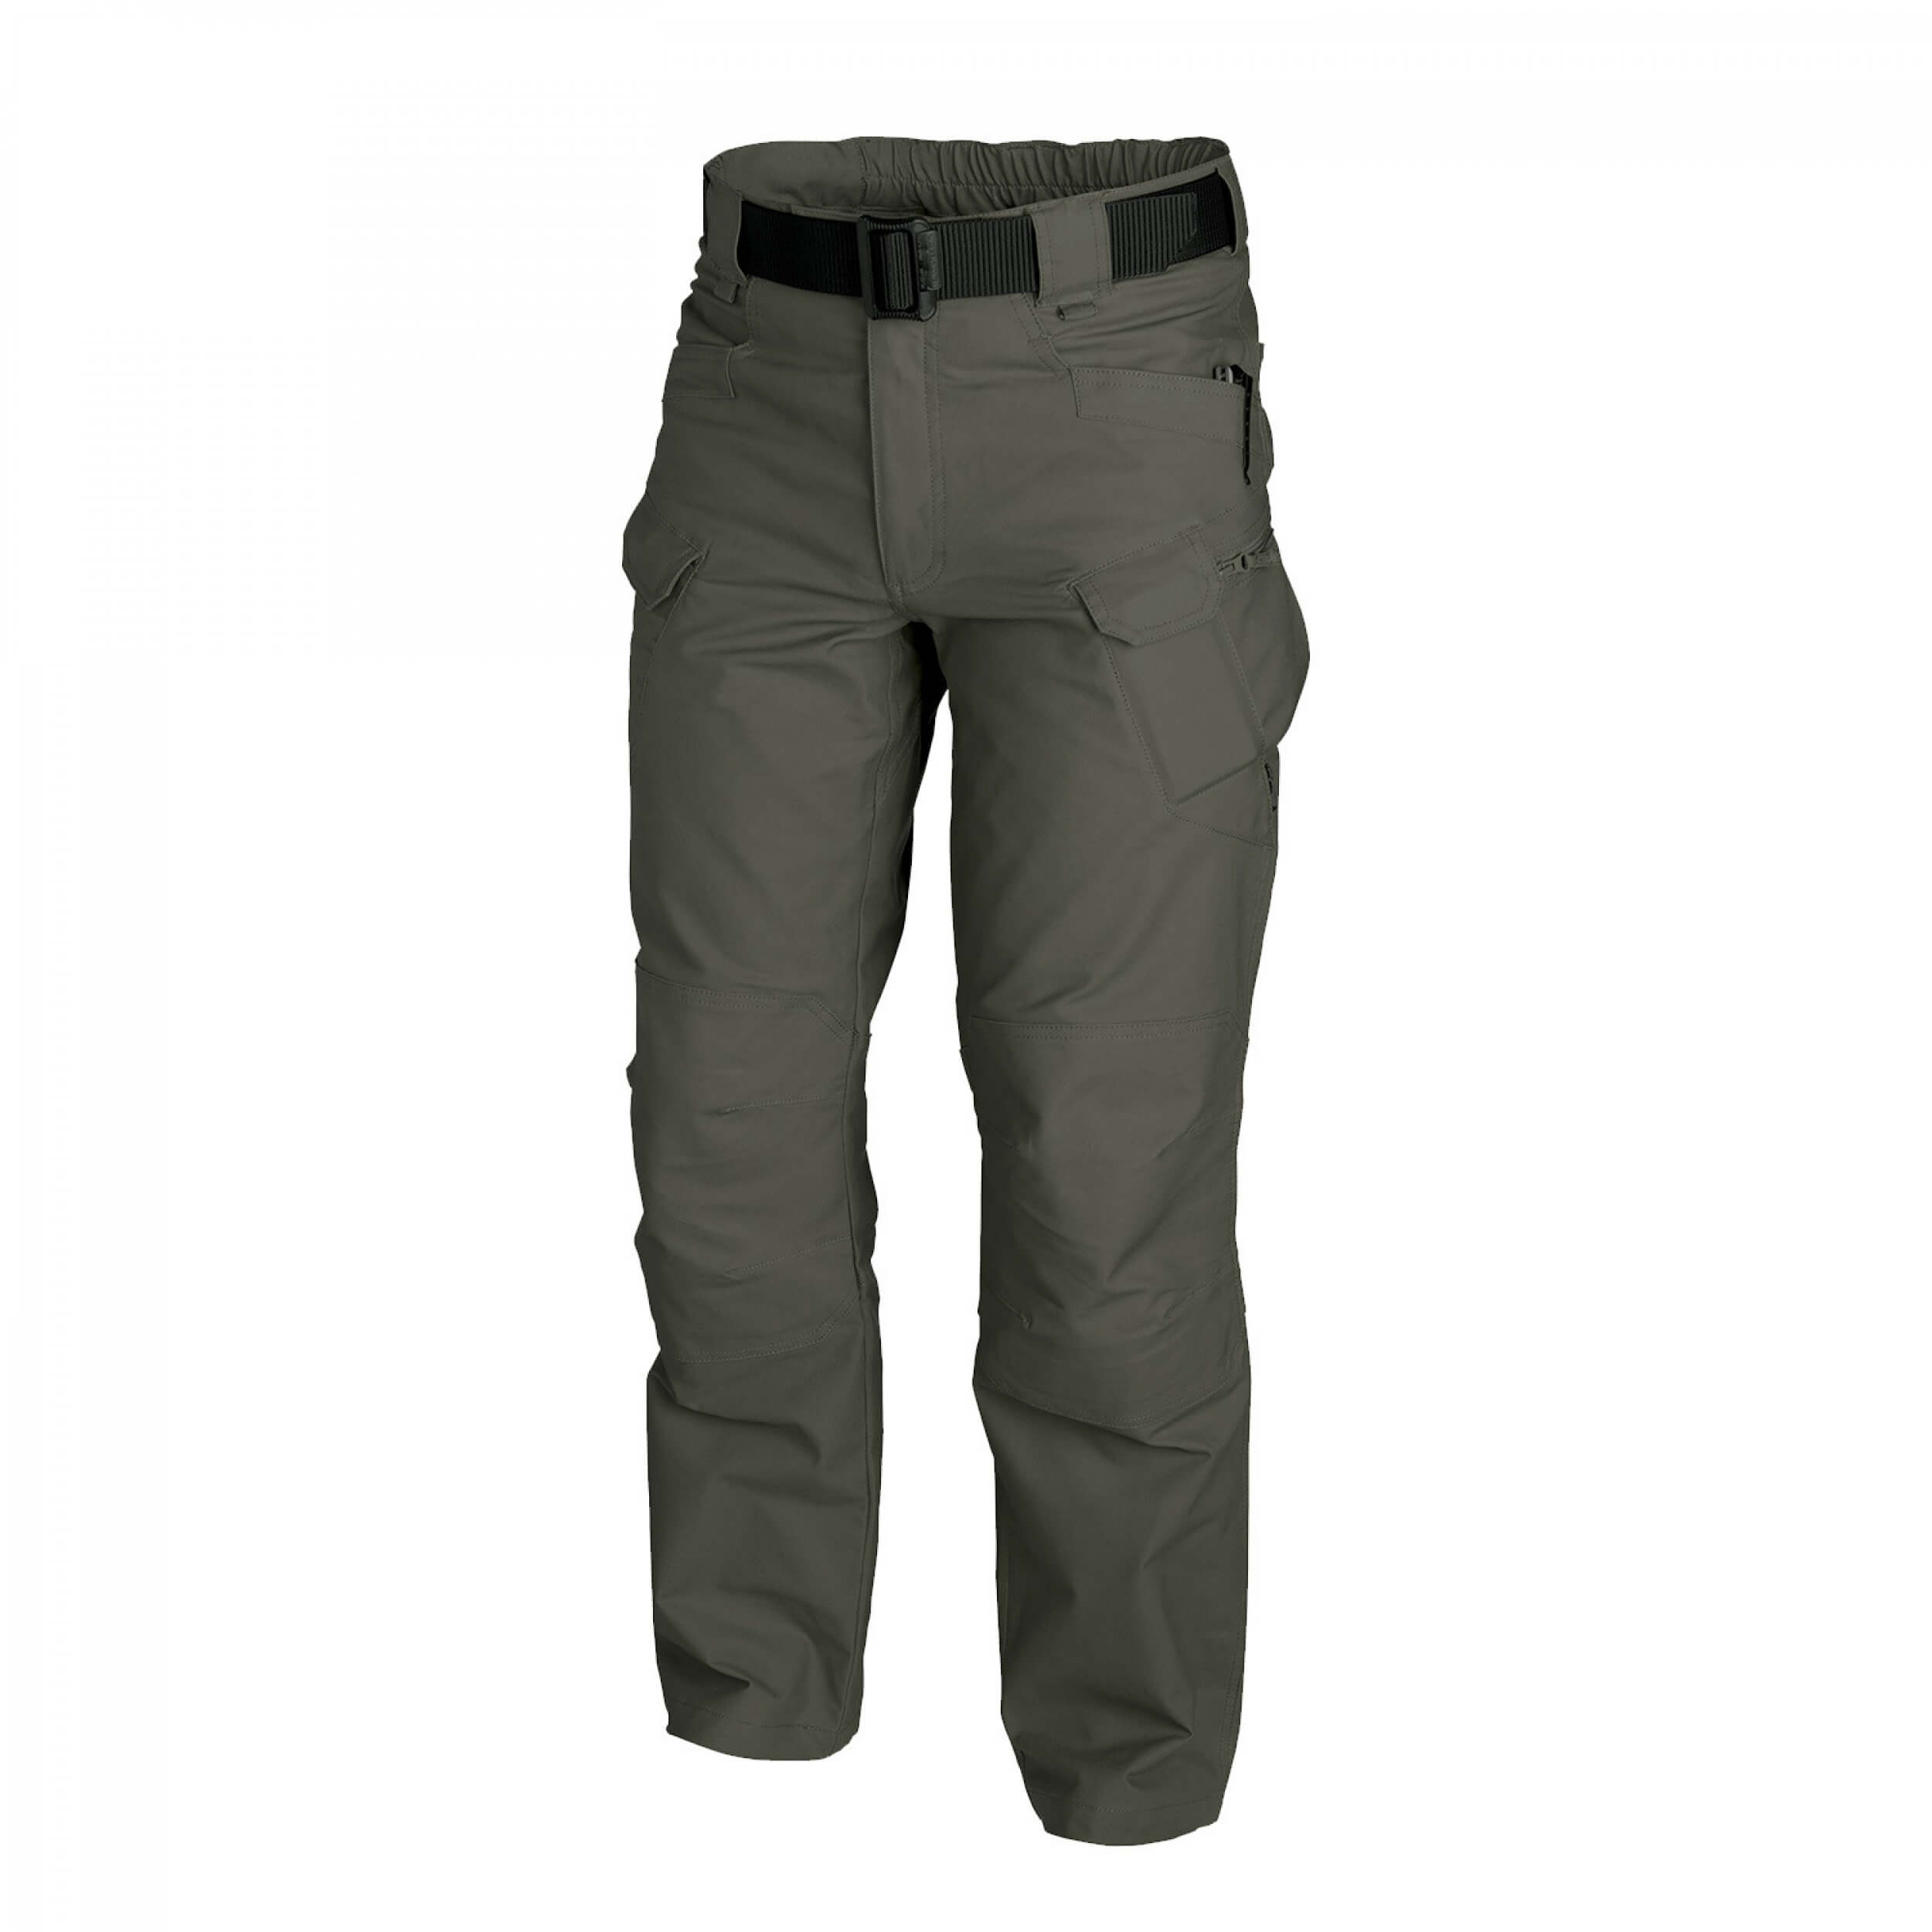 Helikon-Tex Urban Tactical Pants Ripstop Taiga Green